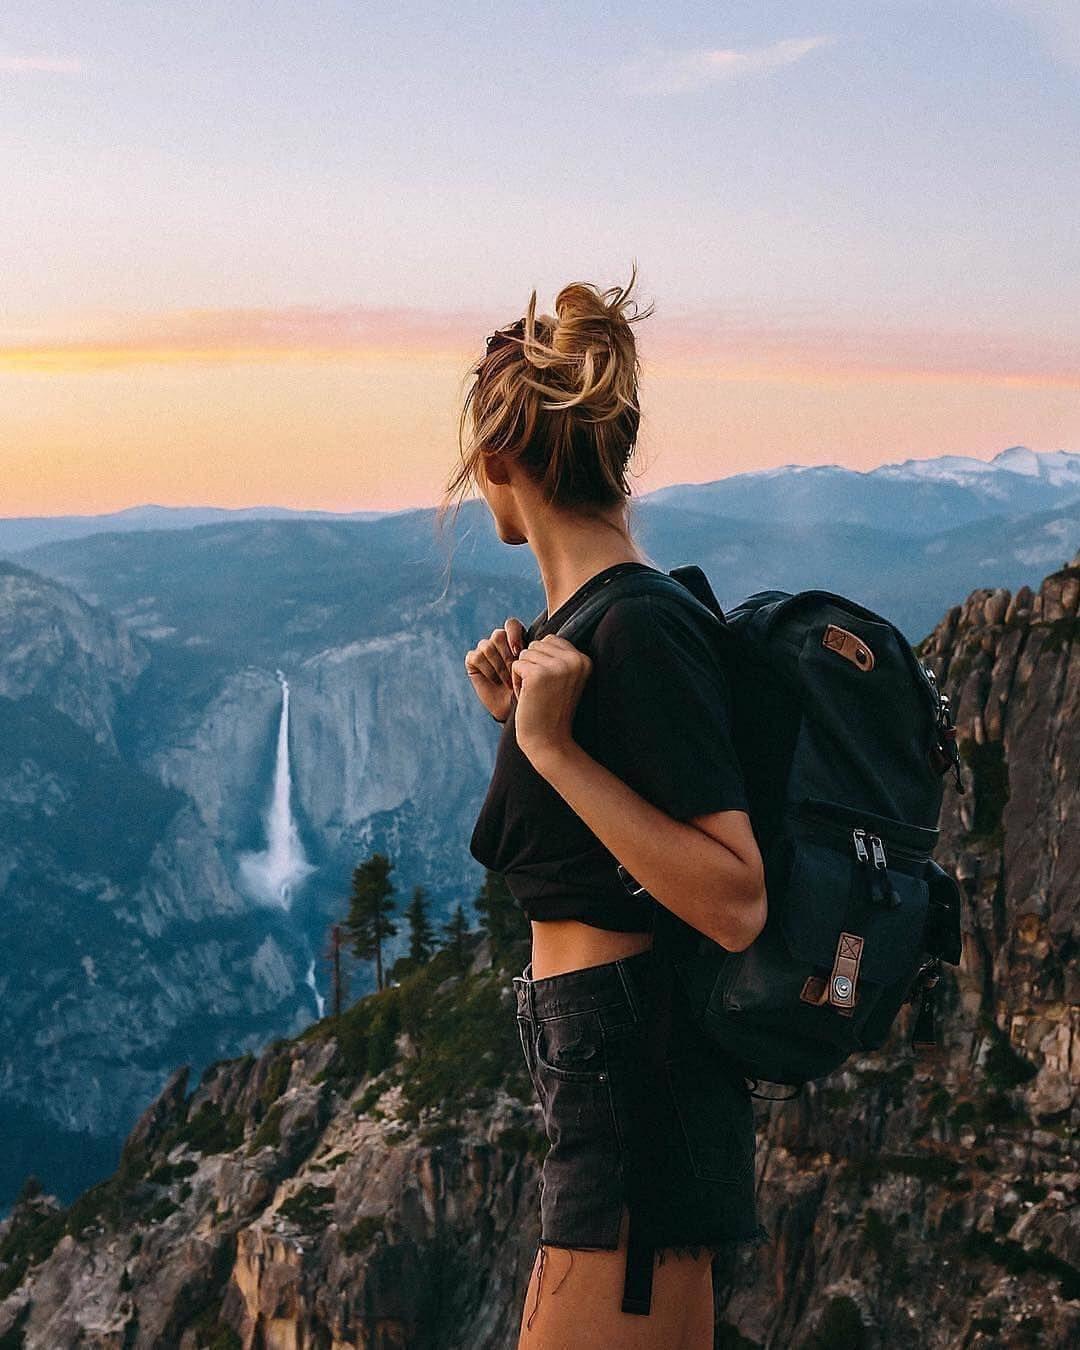 Top 7 National Parks in the USA - Yosemite #Yosemite #NationalParks